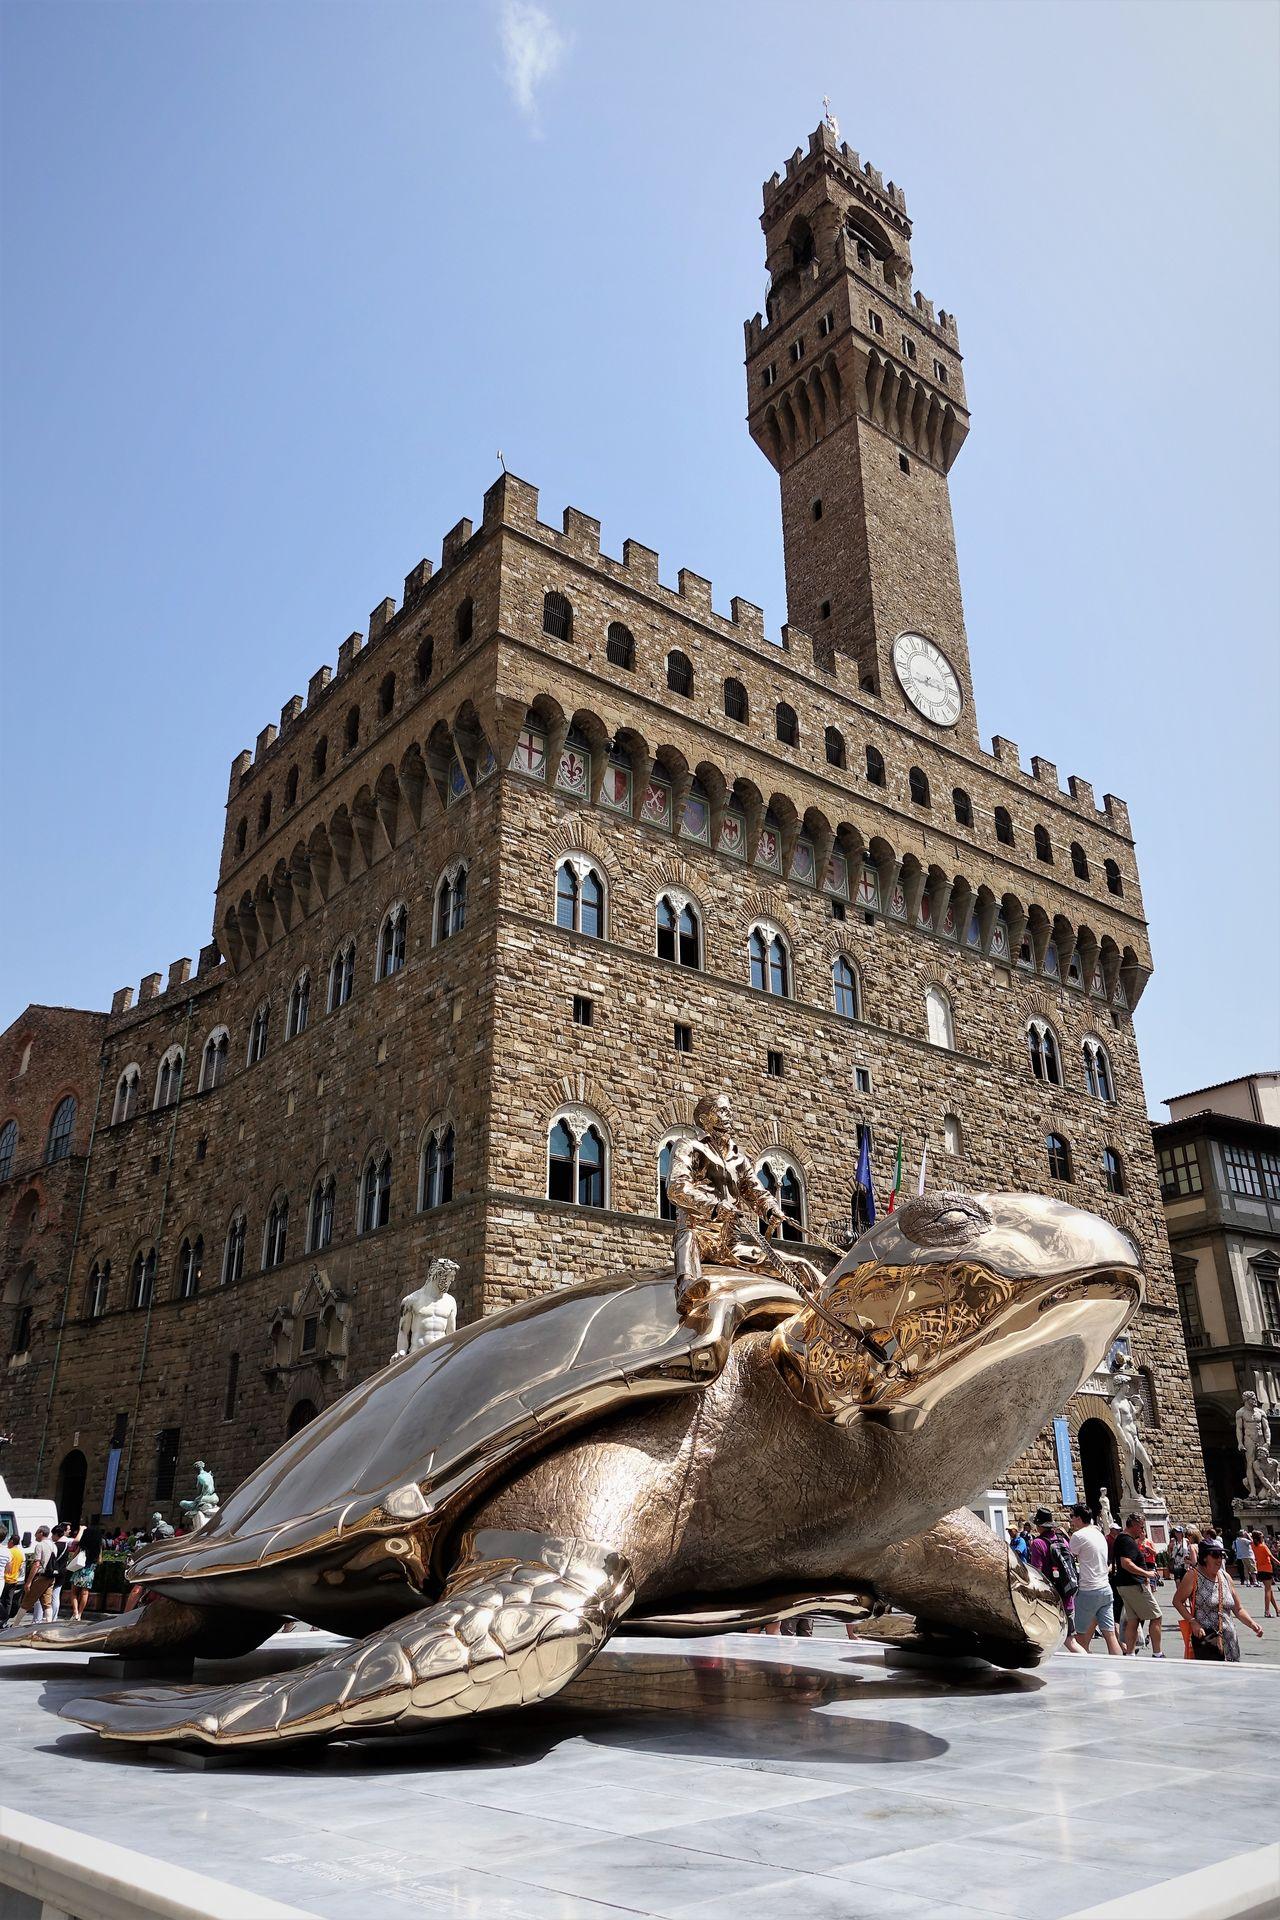 Palazzo Vecchio and Piazza della Signoria Architecture Building Exterior City Cityscape Day Golden Turtle History Jan Fabre Modern Art No People Outdoors Sculpture Searching Utopia Sky Statue Travel Destinations Water EyeEmNewHere